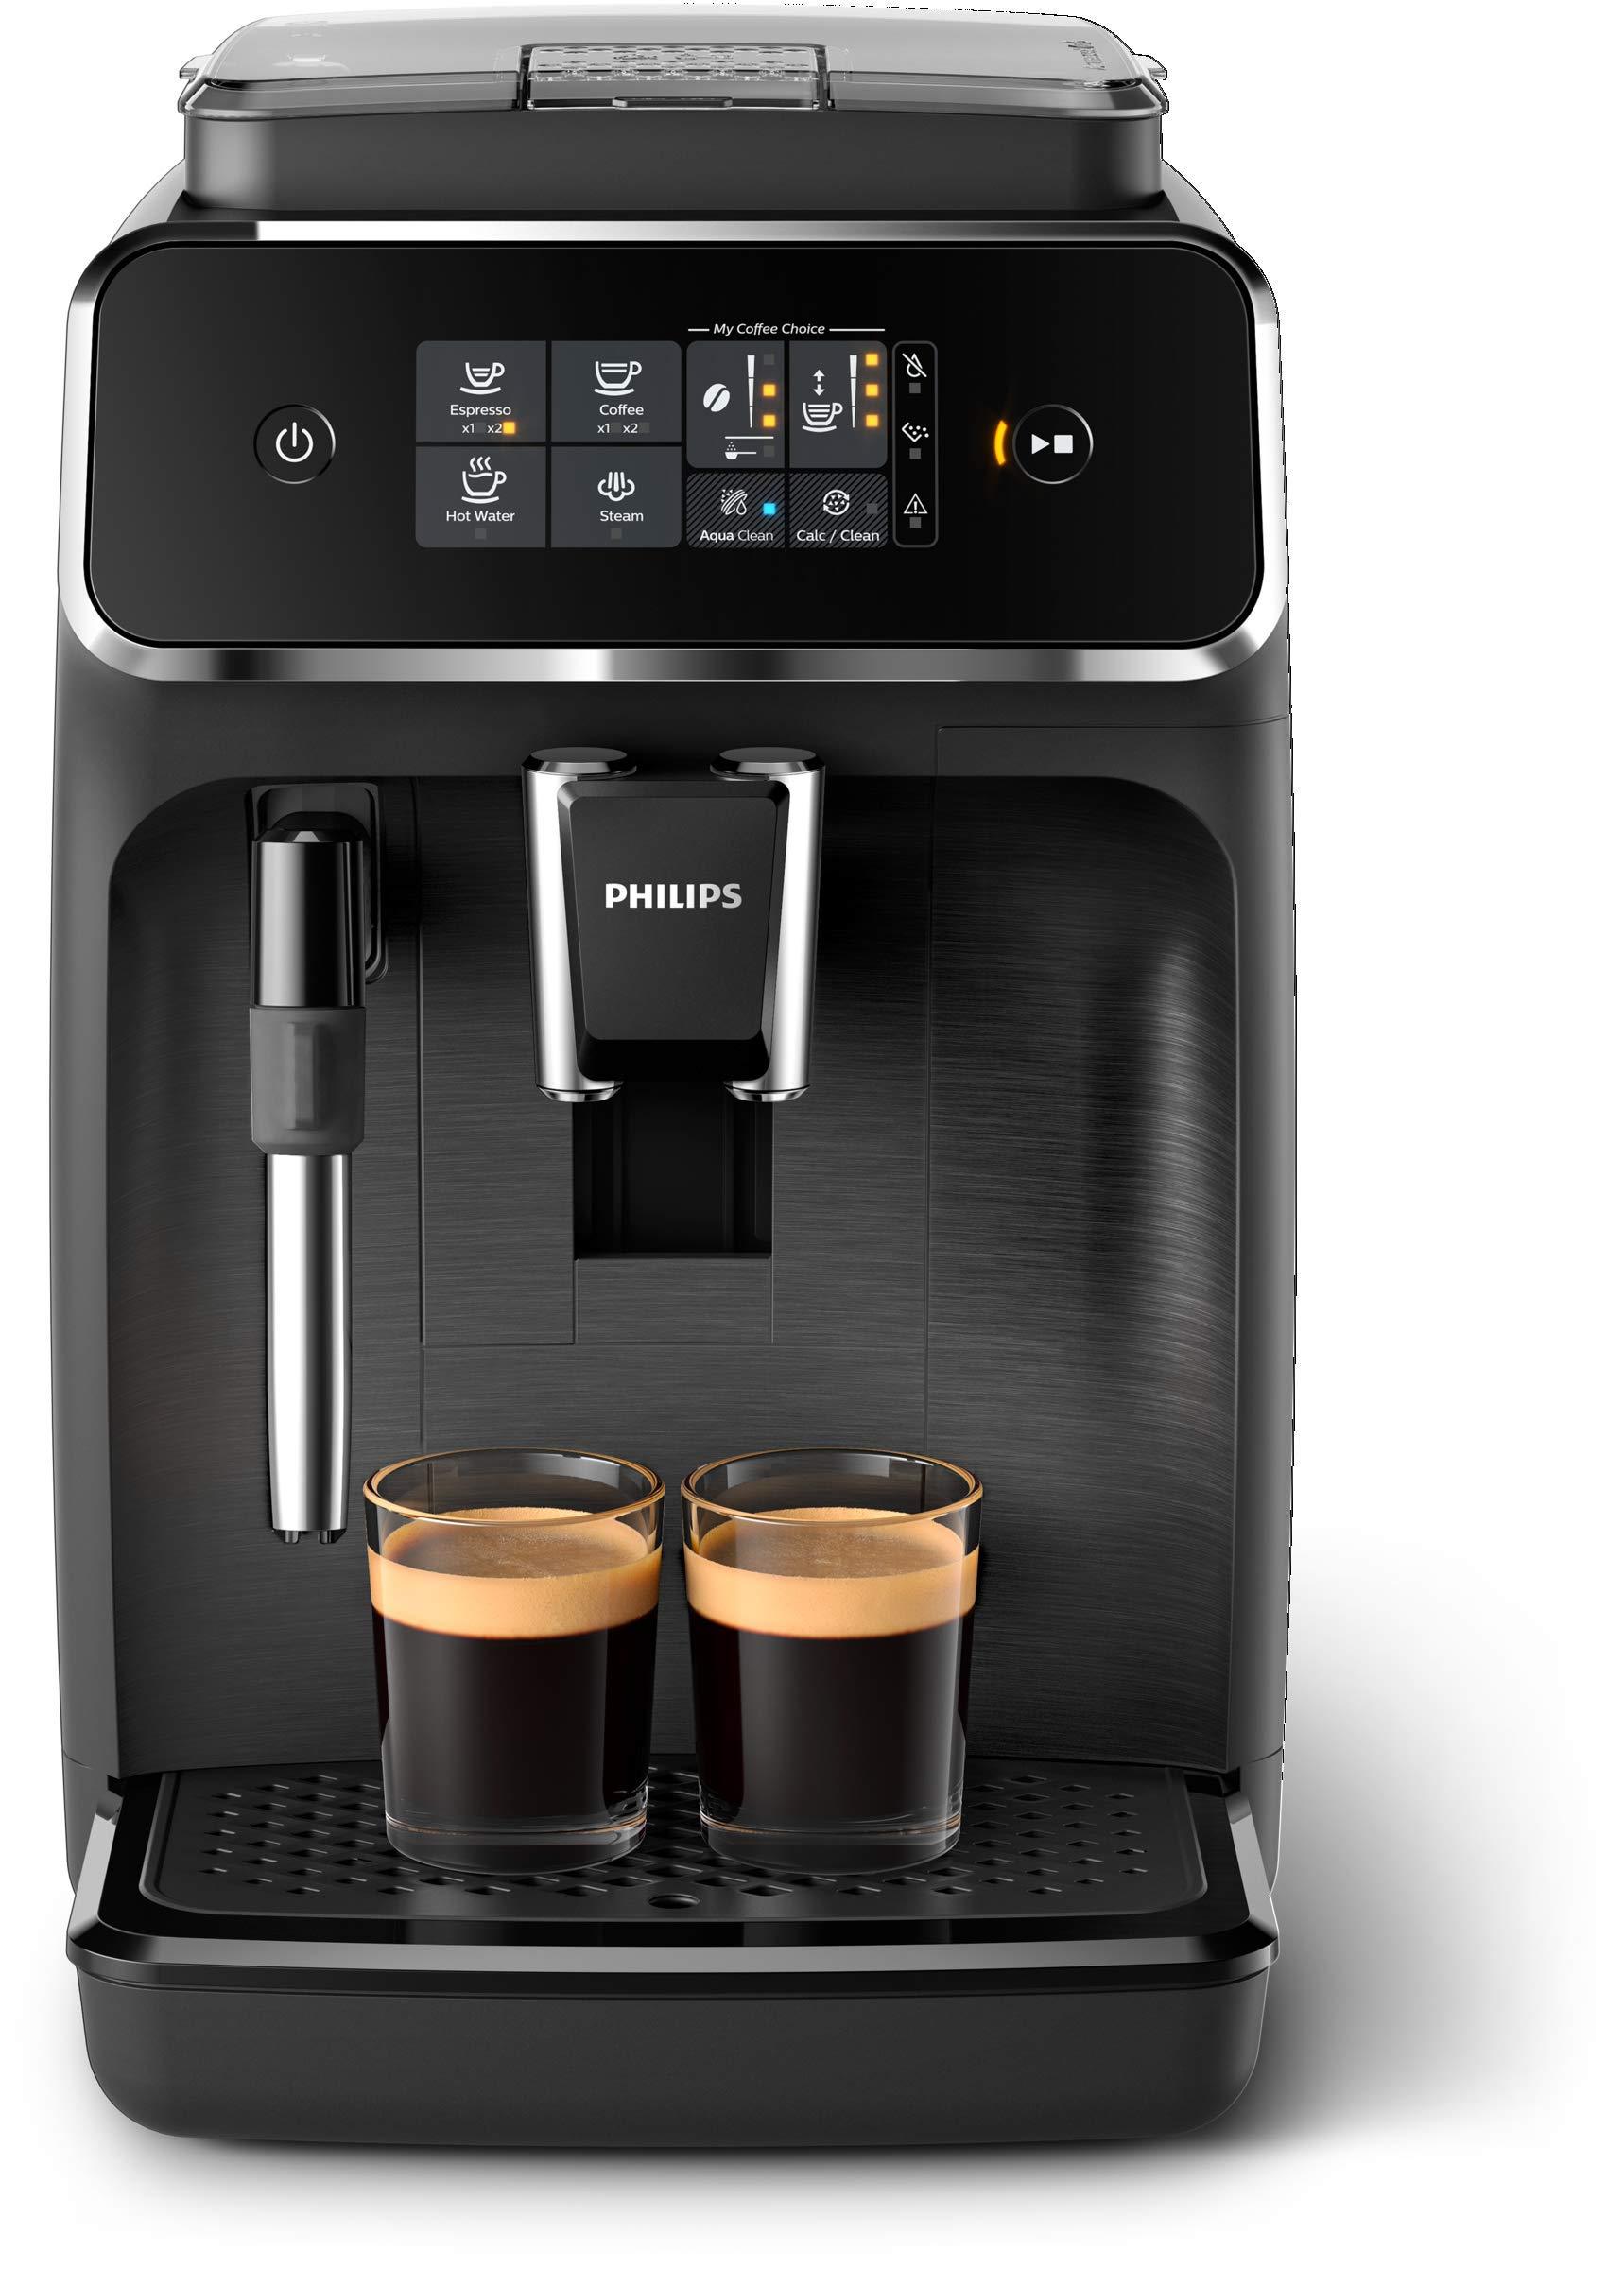 Philips Espresso Machine